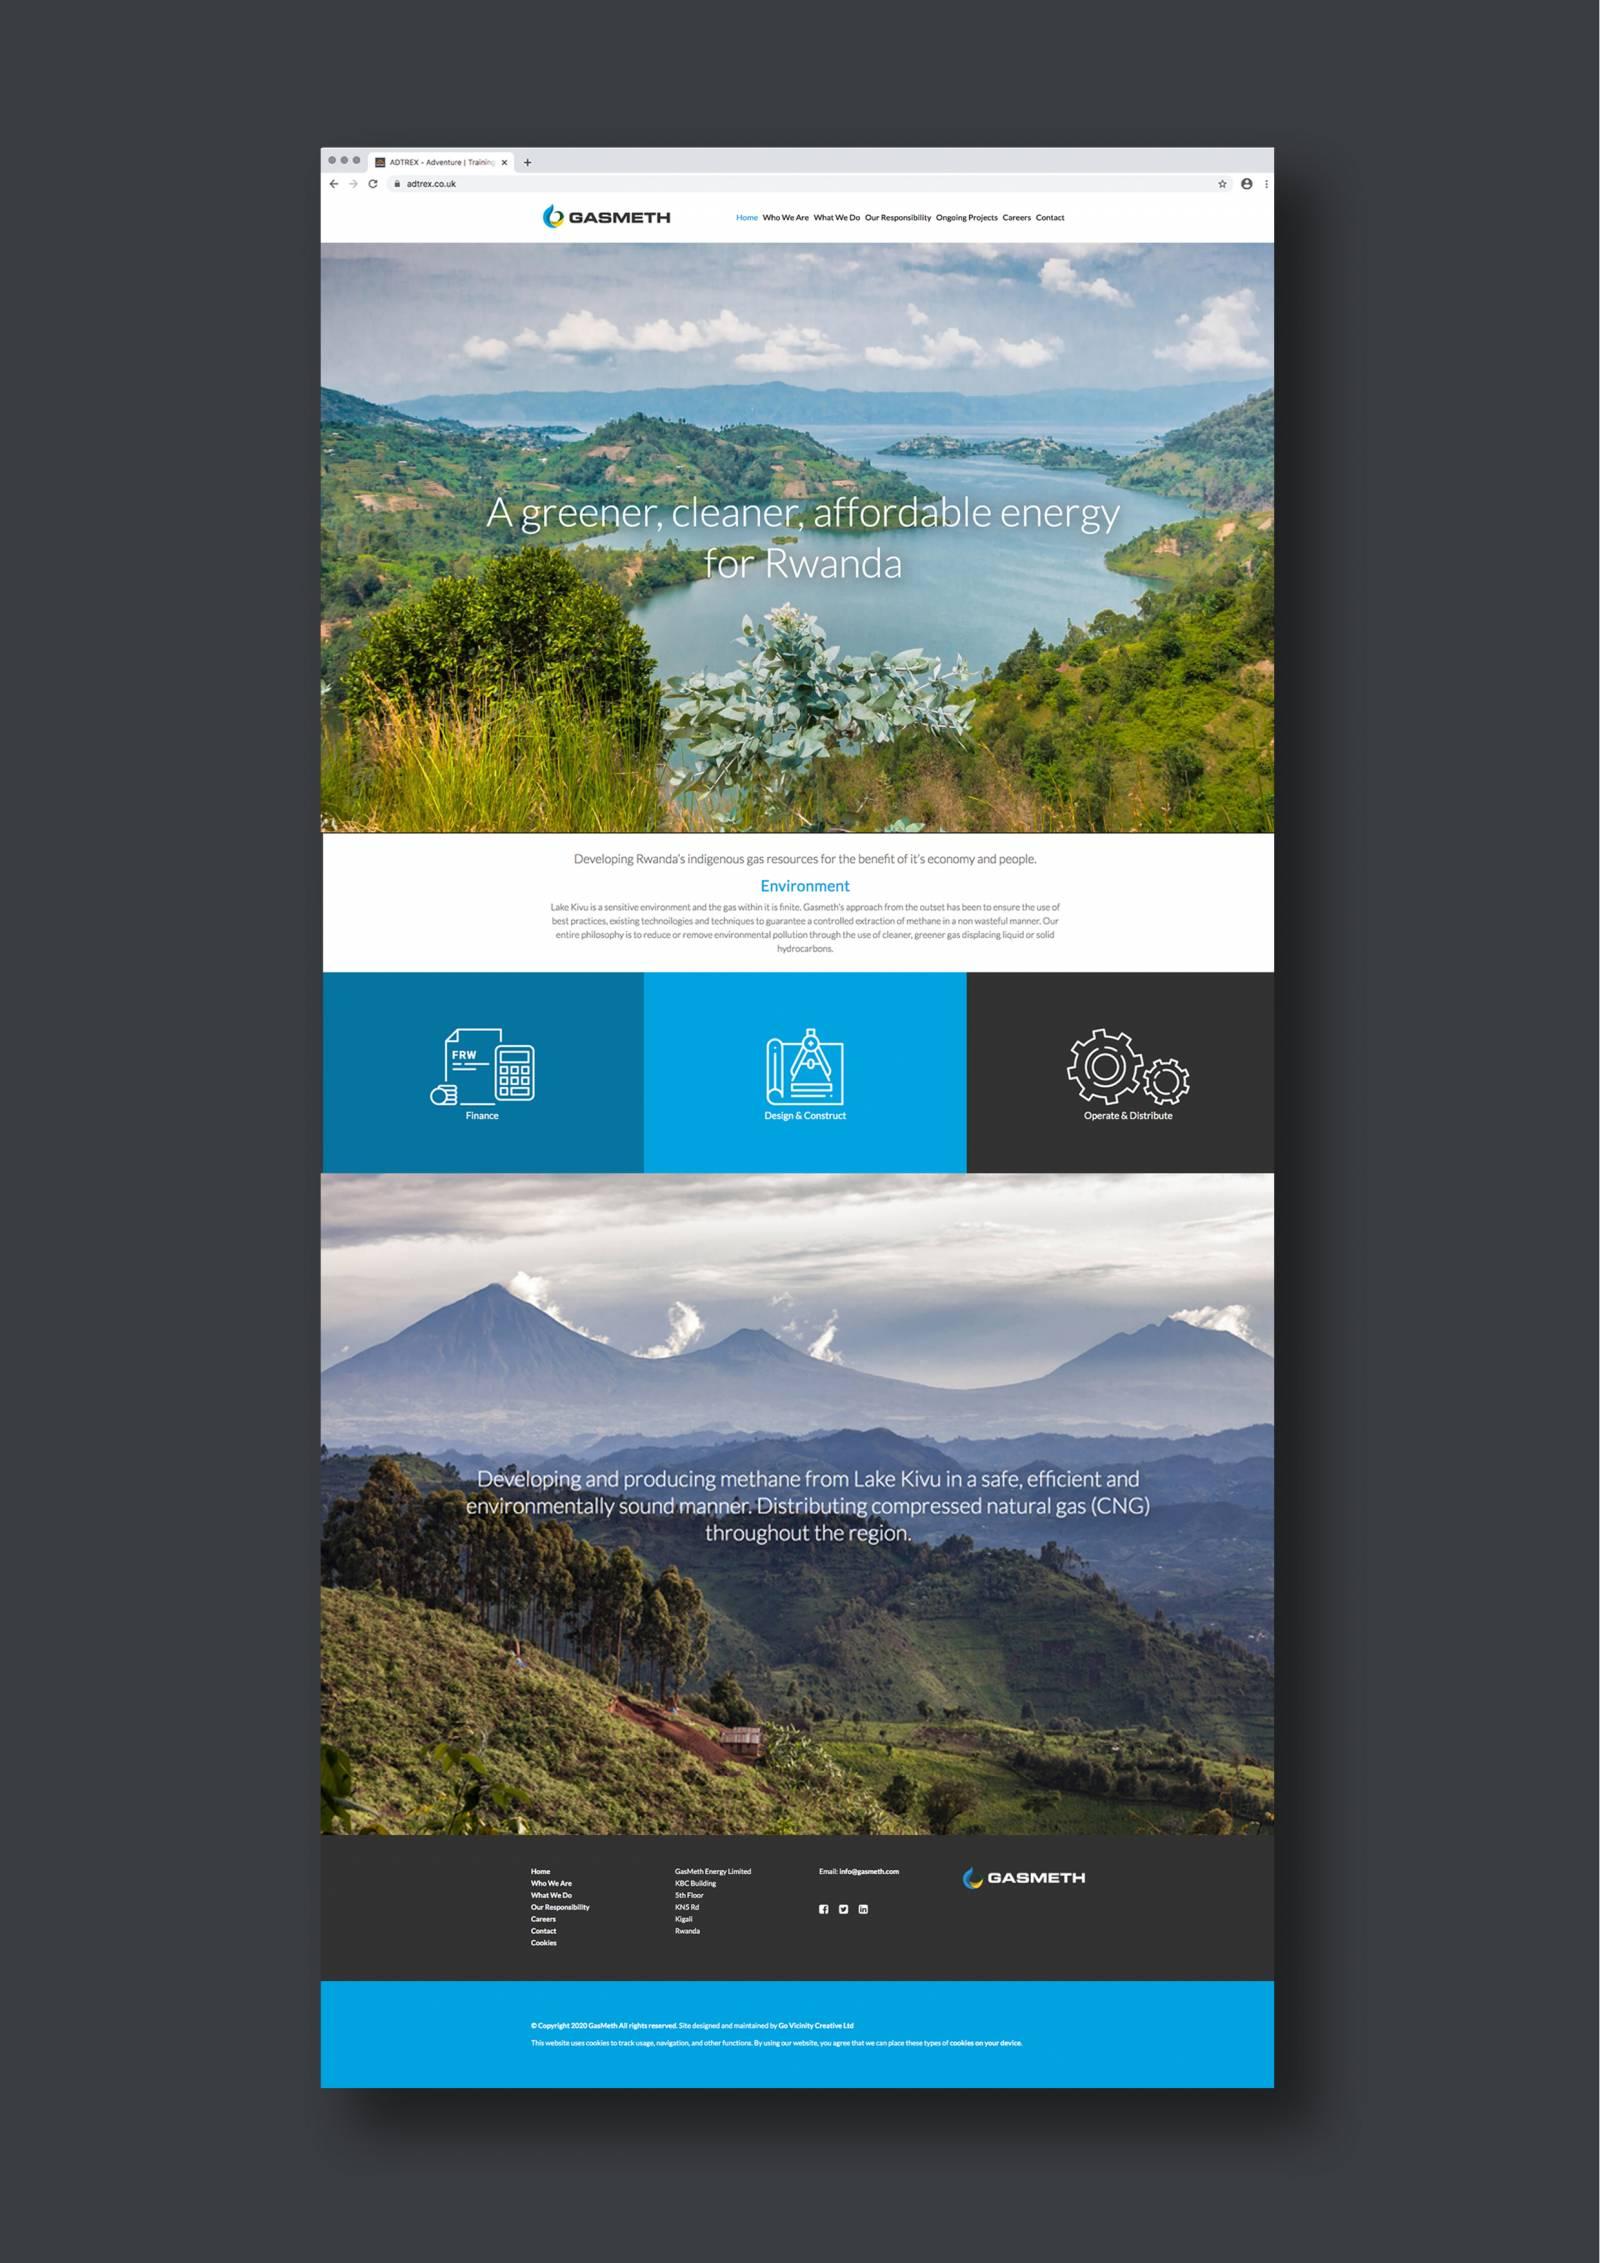 gasmeth-website-design-agency-graphic-design-canterbury.jpg